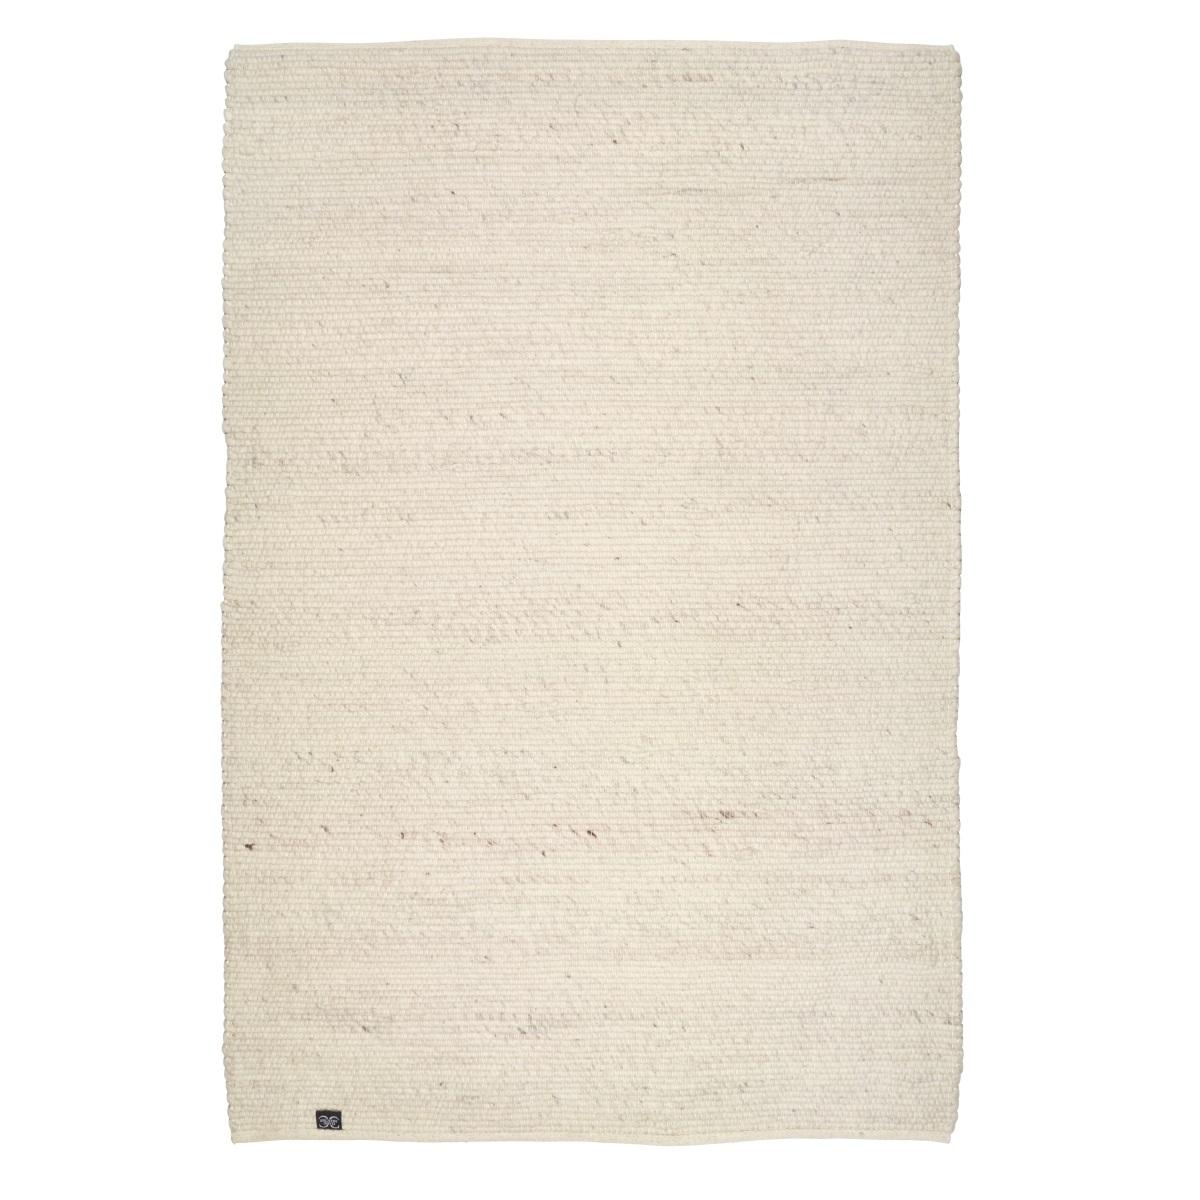 Ullmatta Merino vit 200 x 300 cm Classic Collection